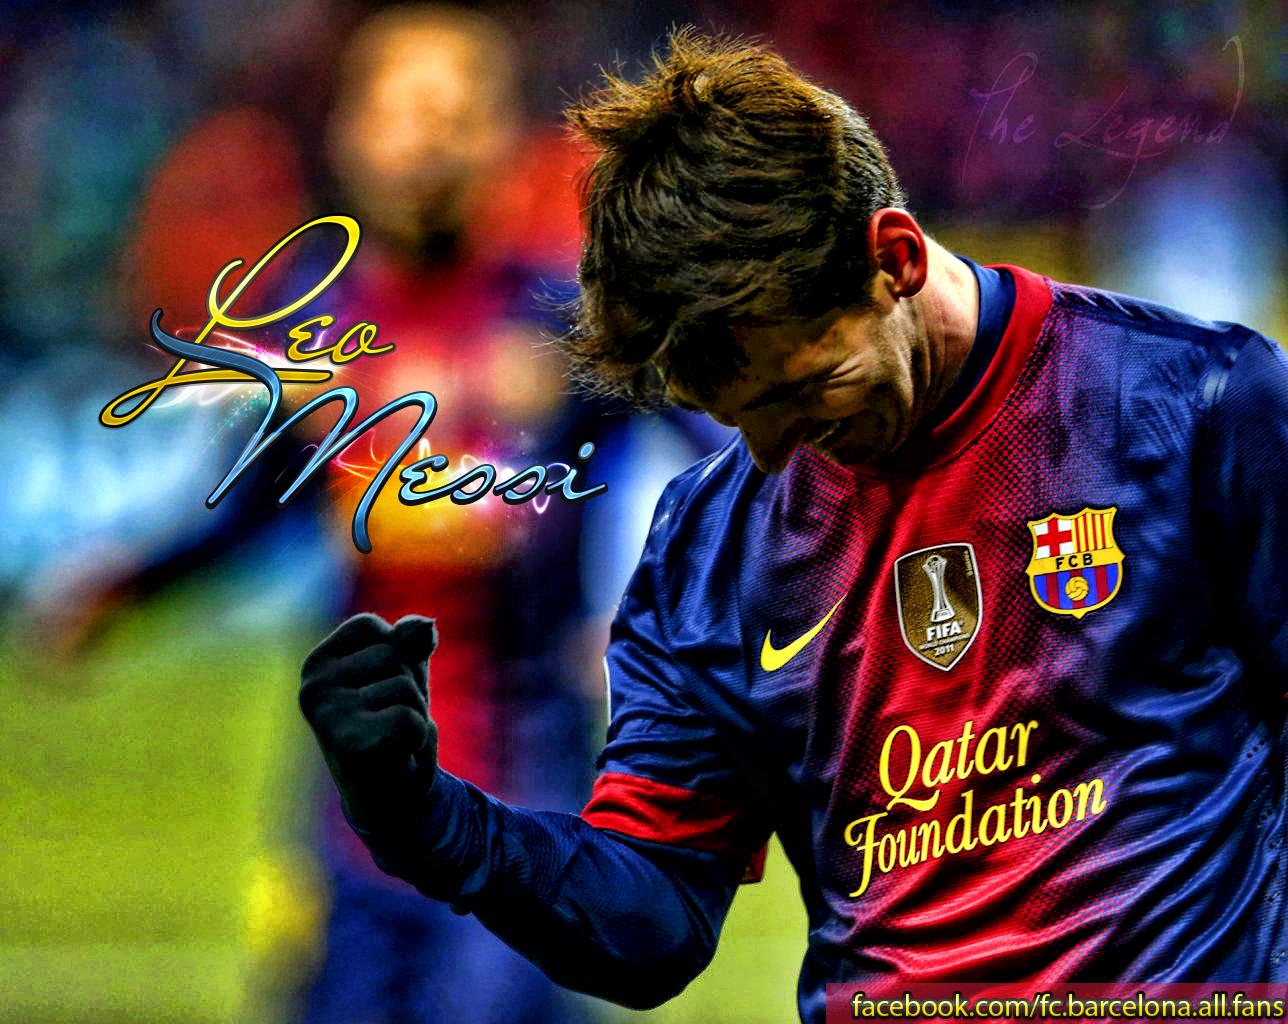 Sports Legend Lionel Messi Wallpaper 3 1288x1024